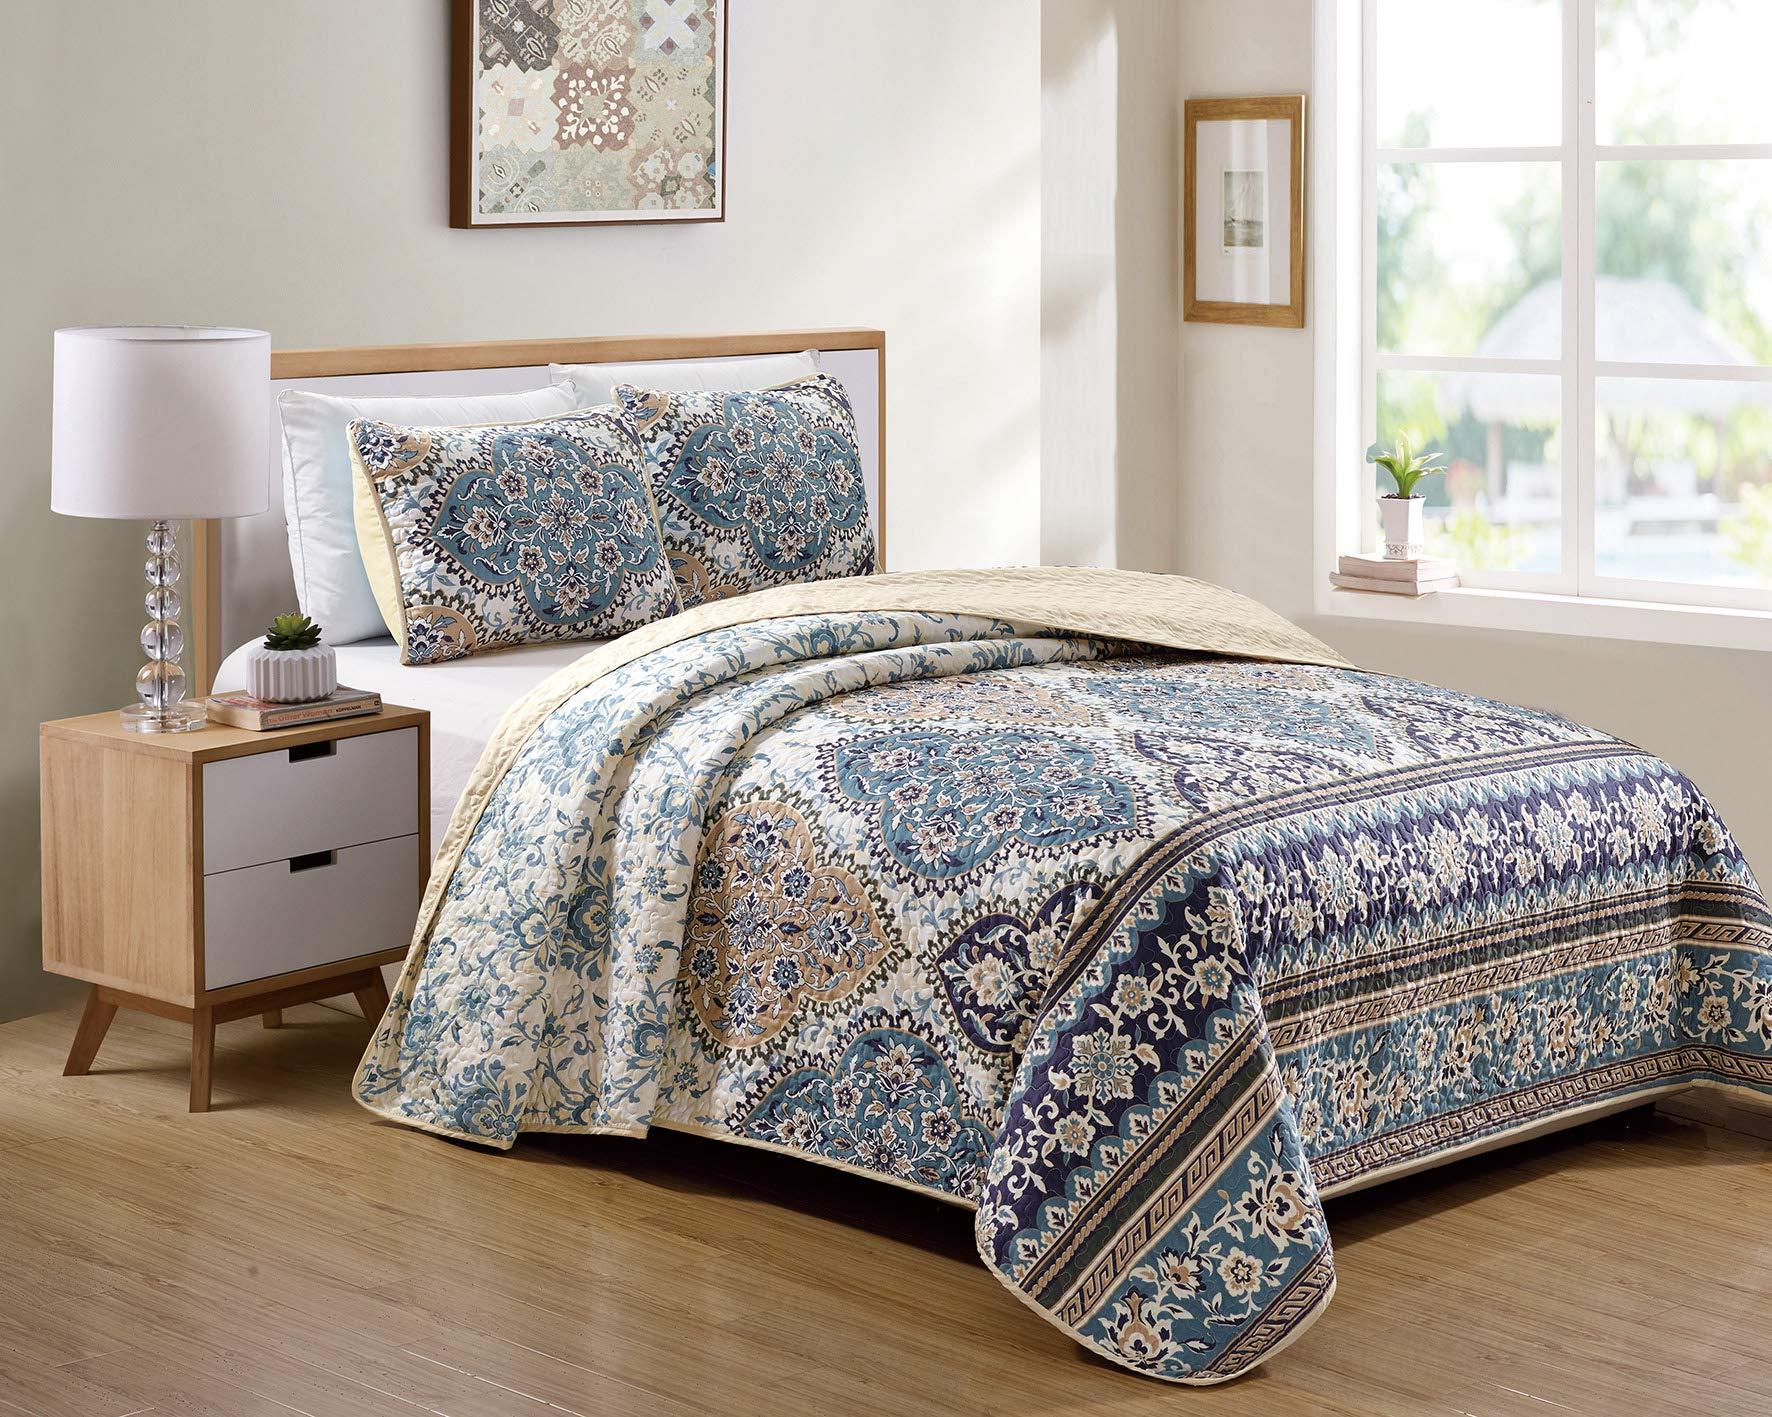 Kids Zone Home Linen 2 Piece Twin/Twin Extra Long Bedspread Set Floral Pattern Blue Beige Off White by Kids Zone Home Linen